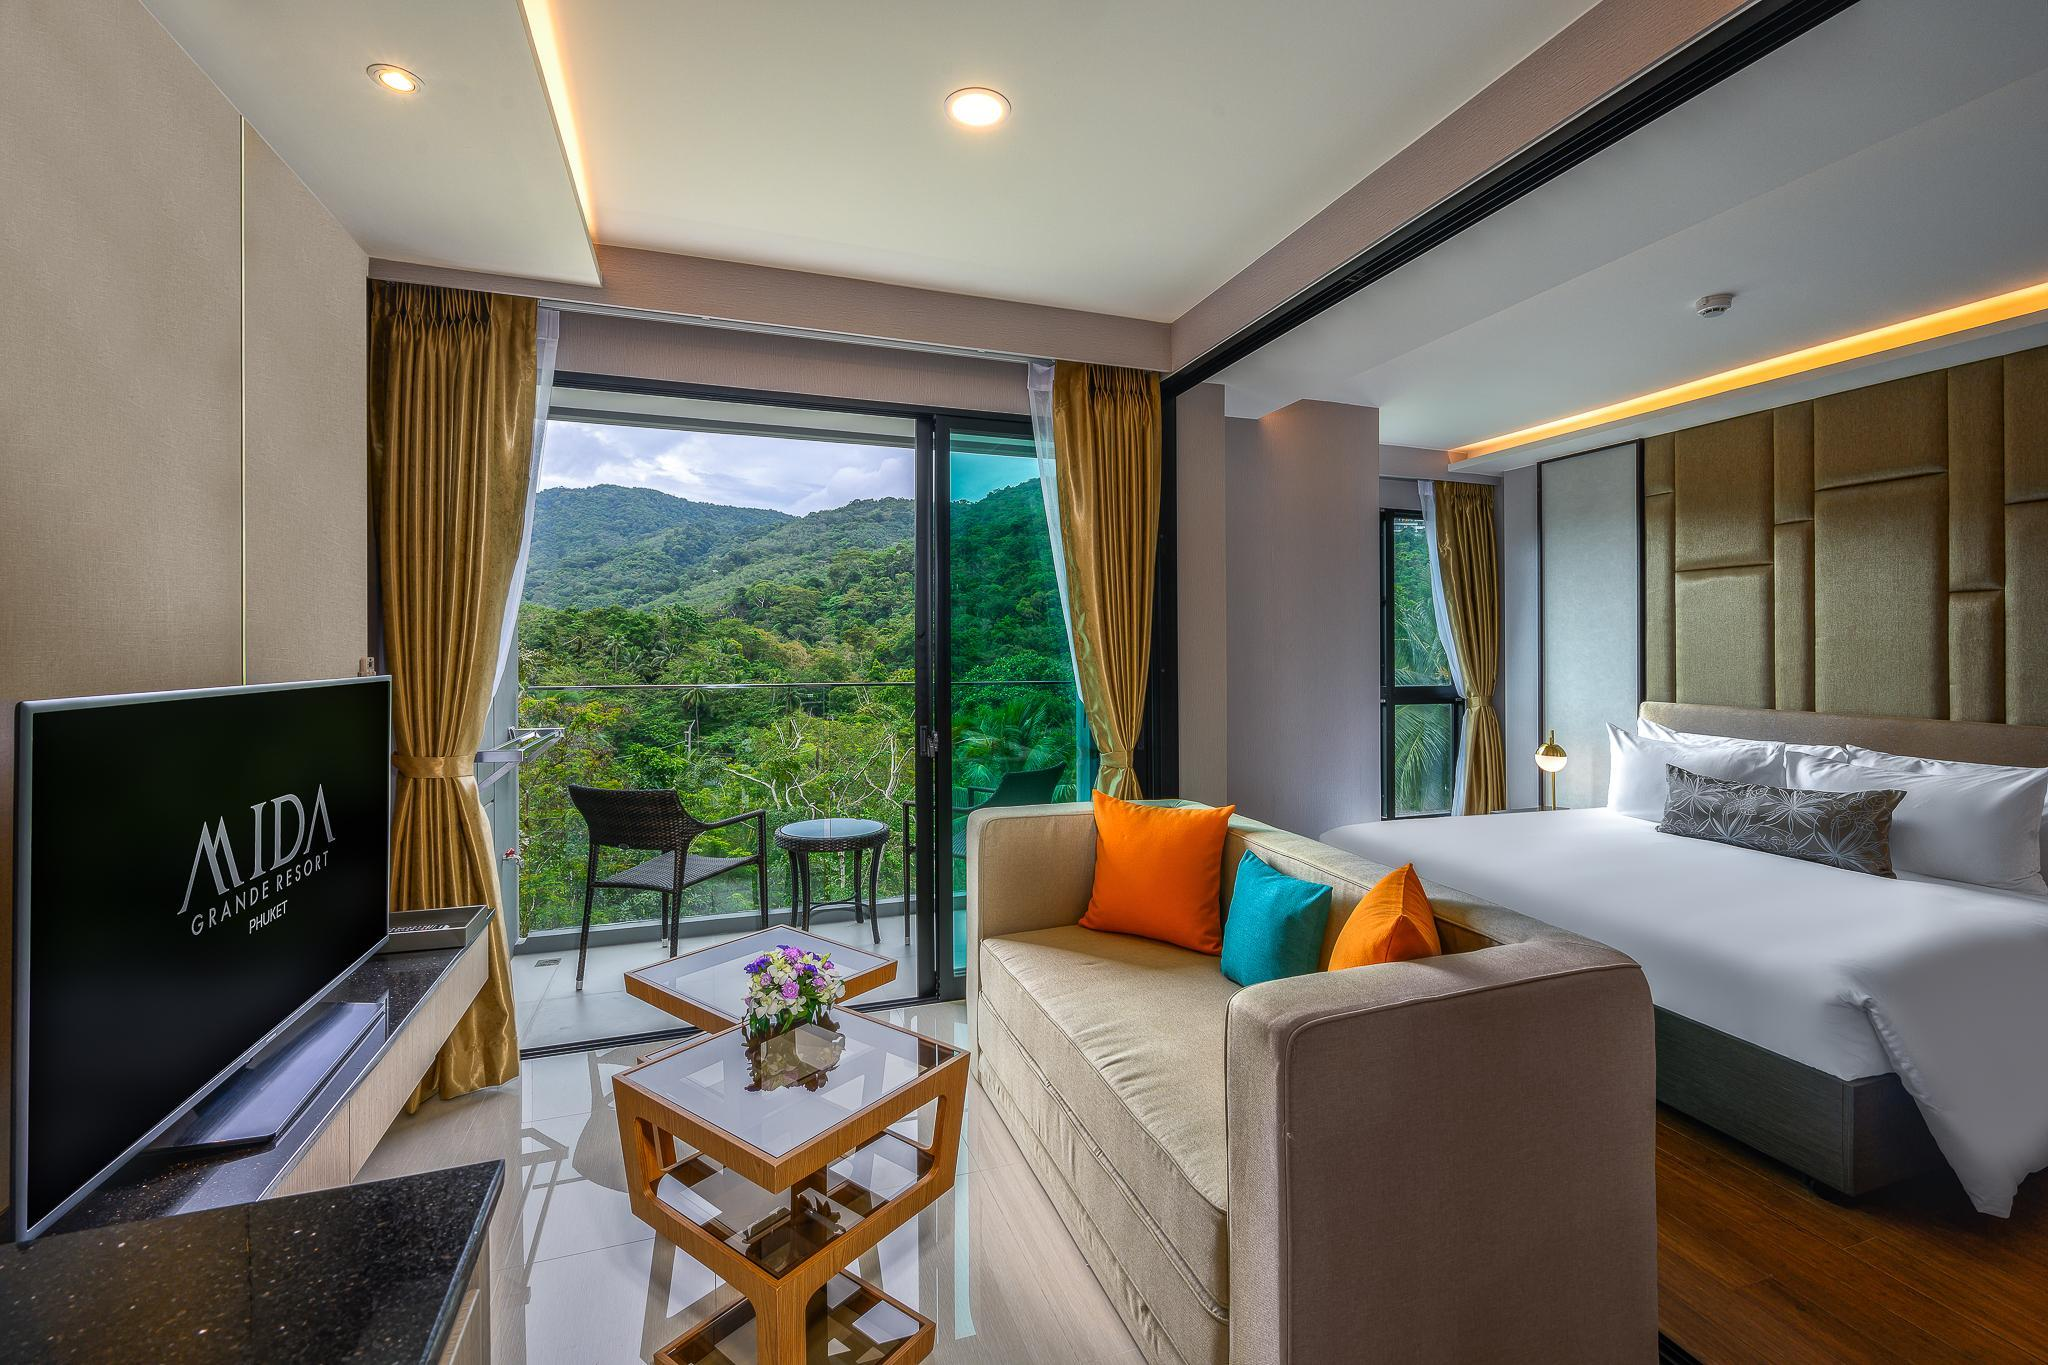 MIDA Grande Resort Phuket, Pulau Phuket